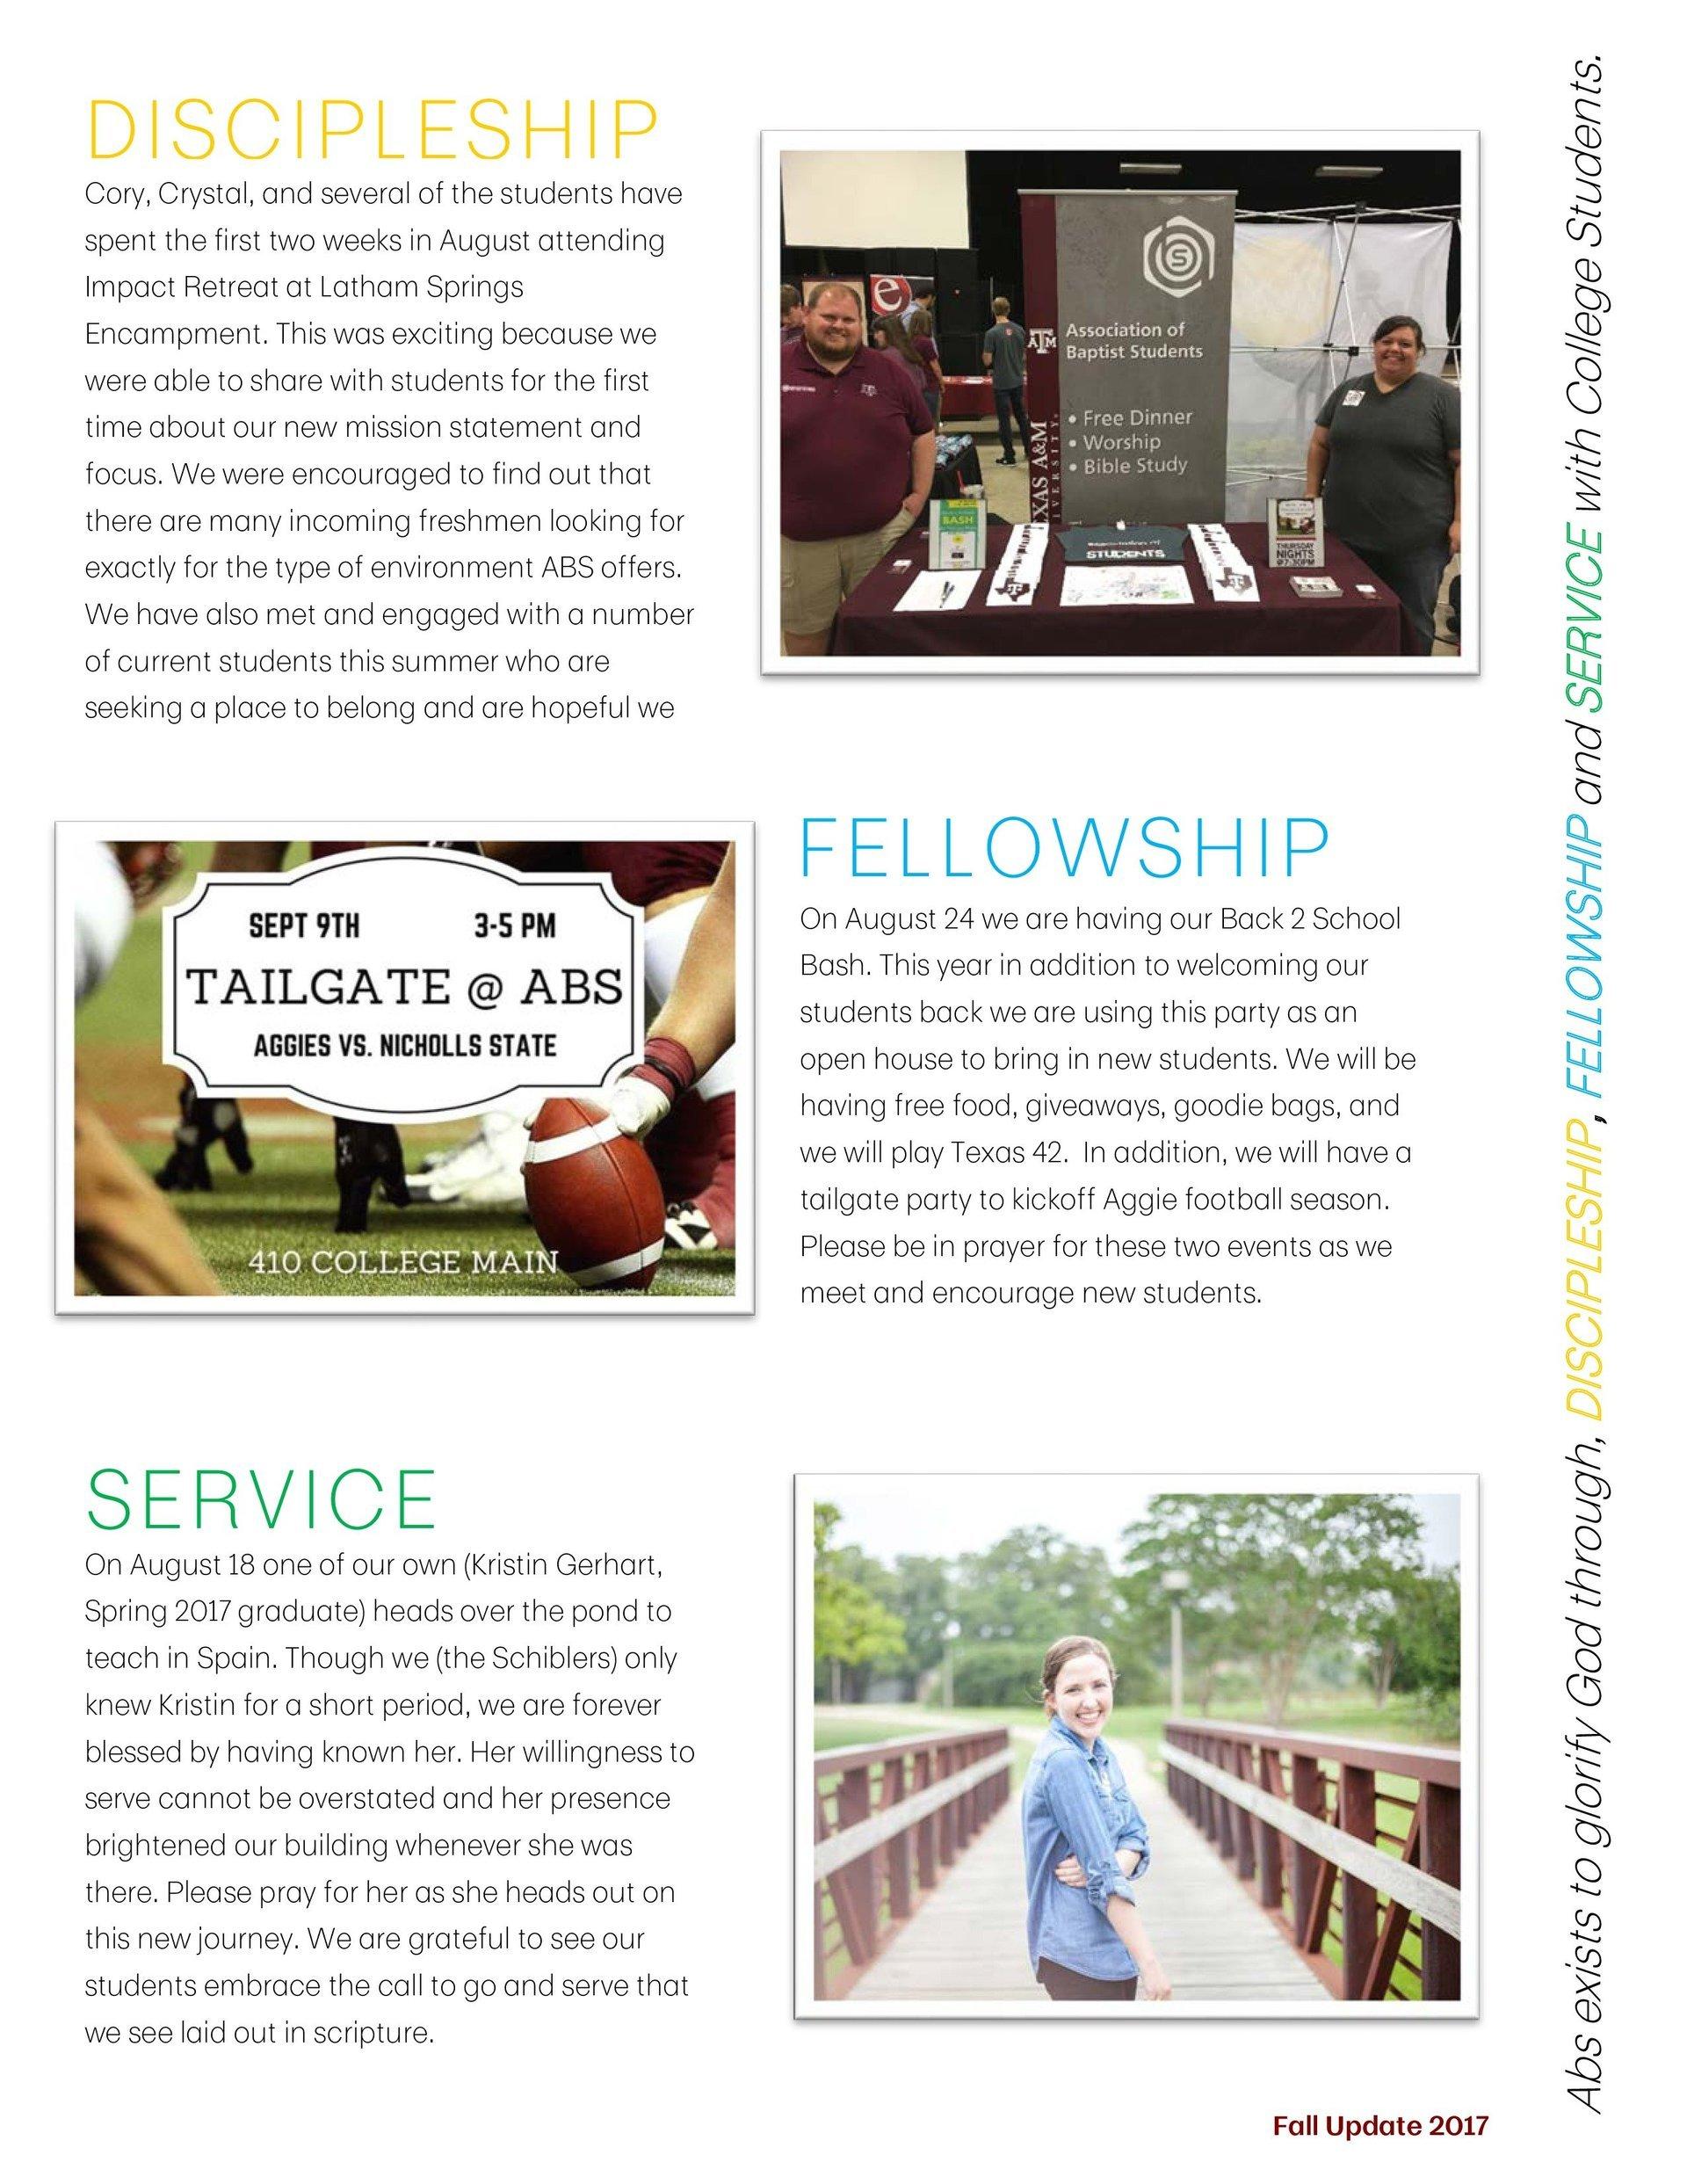 Spring Retreat Mission Waco Leadership Team Women's Ministry Eat